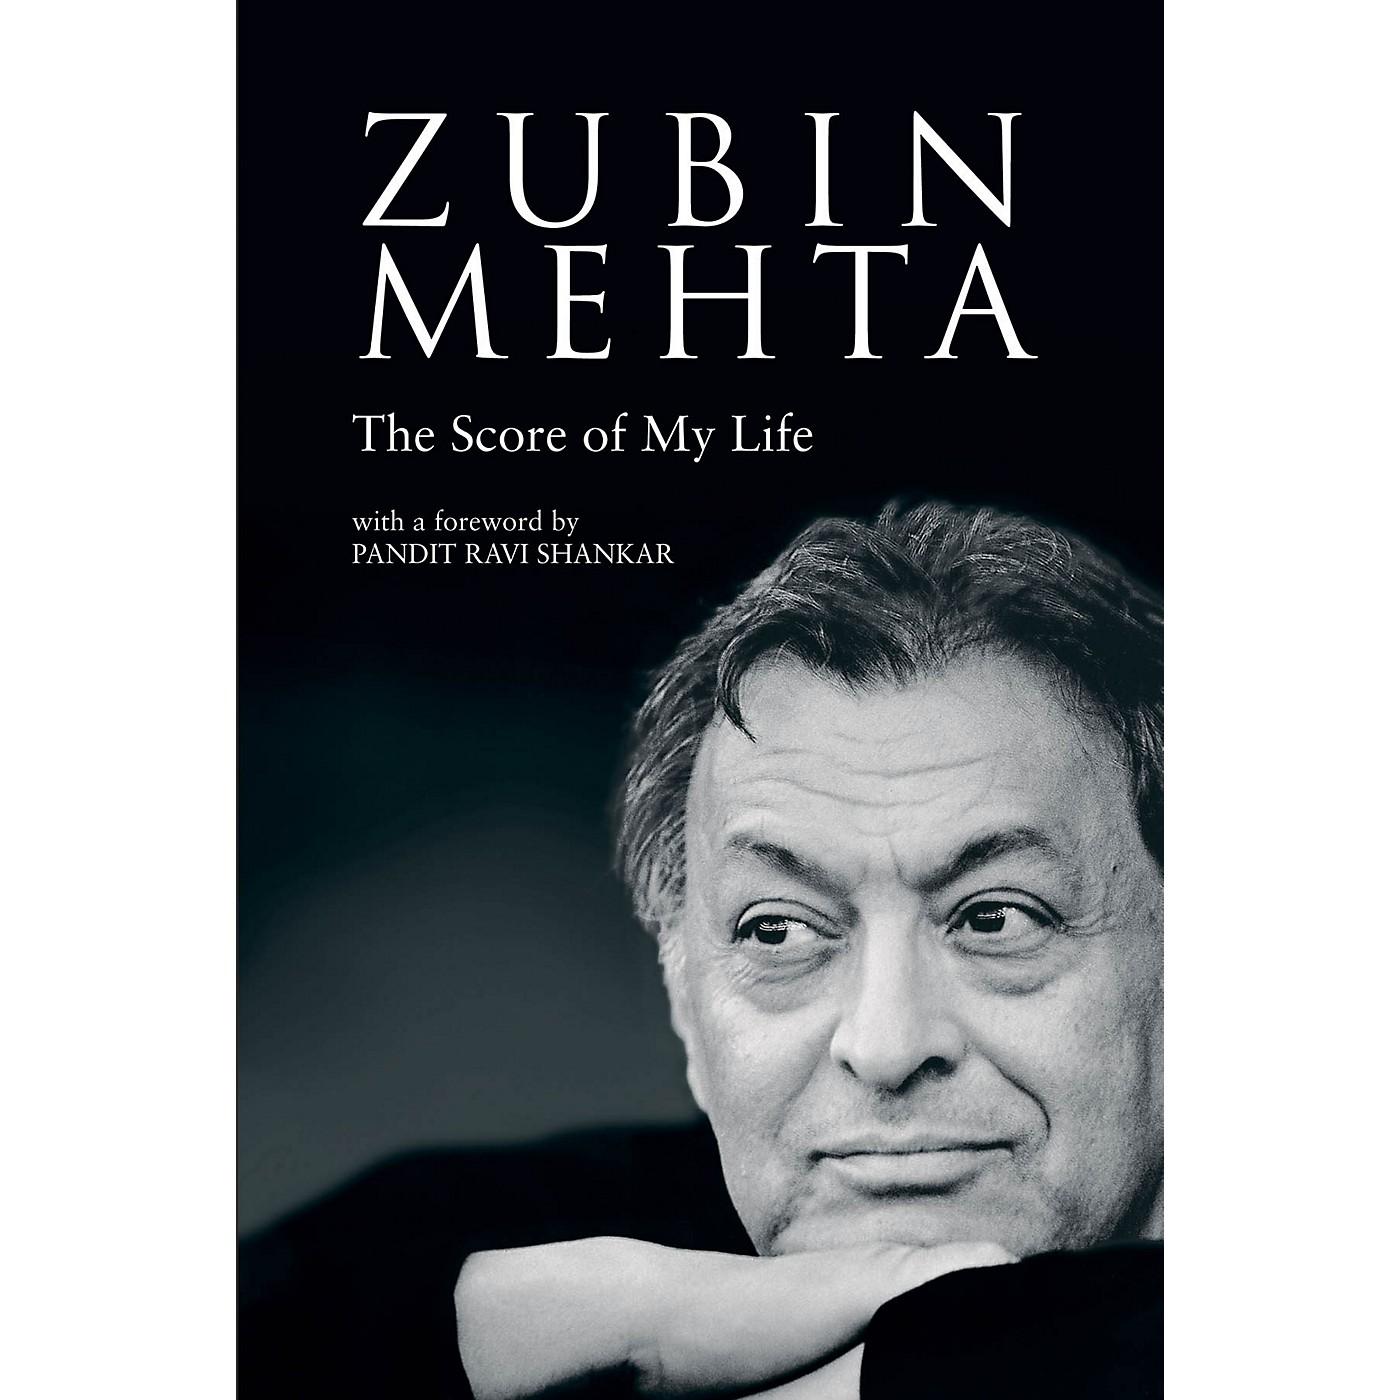 Amadeus Press Zubin Mehta (The Score of My Life) Amadeus Series Hardcover Written by Zubin Mehta thumbnail